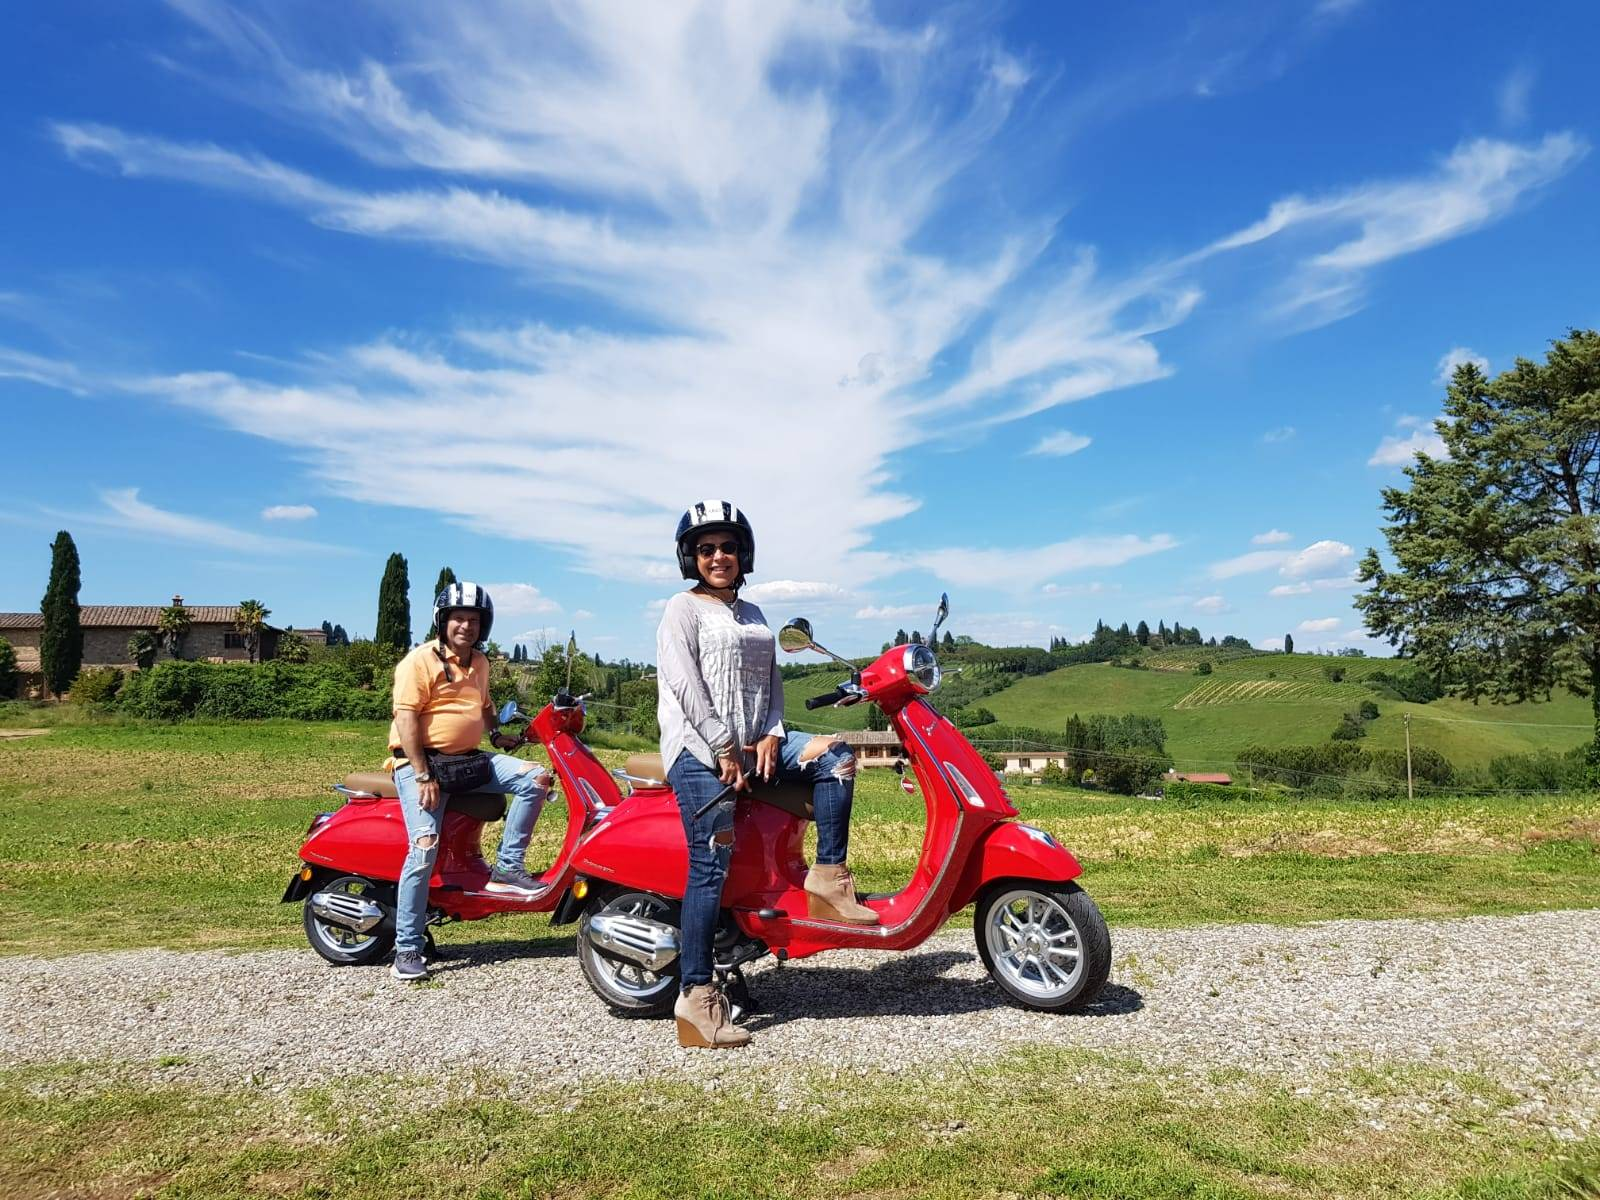 Corfu excursion: Vespa Tour - Palaiokastritsa